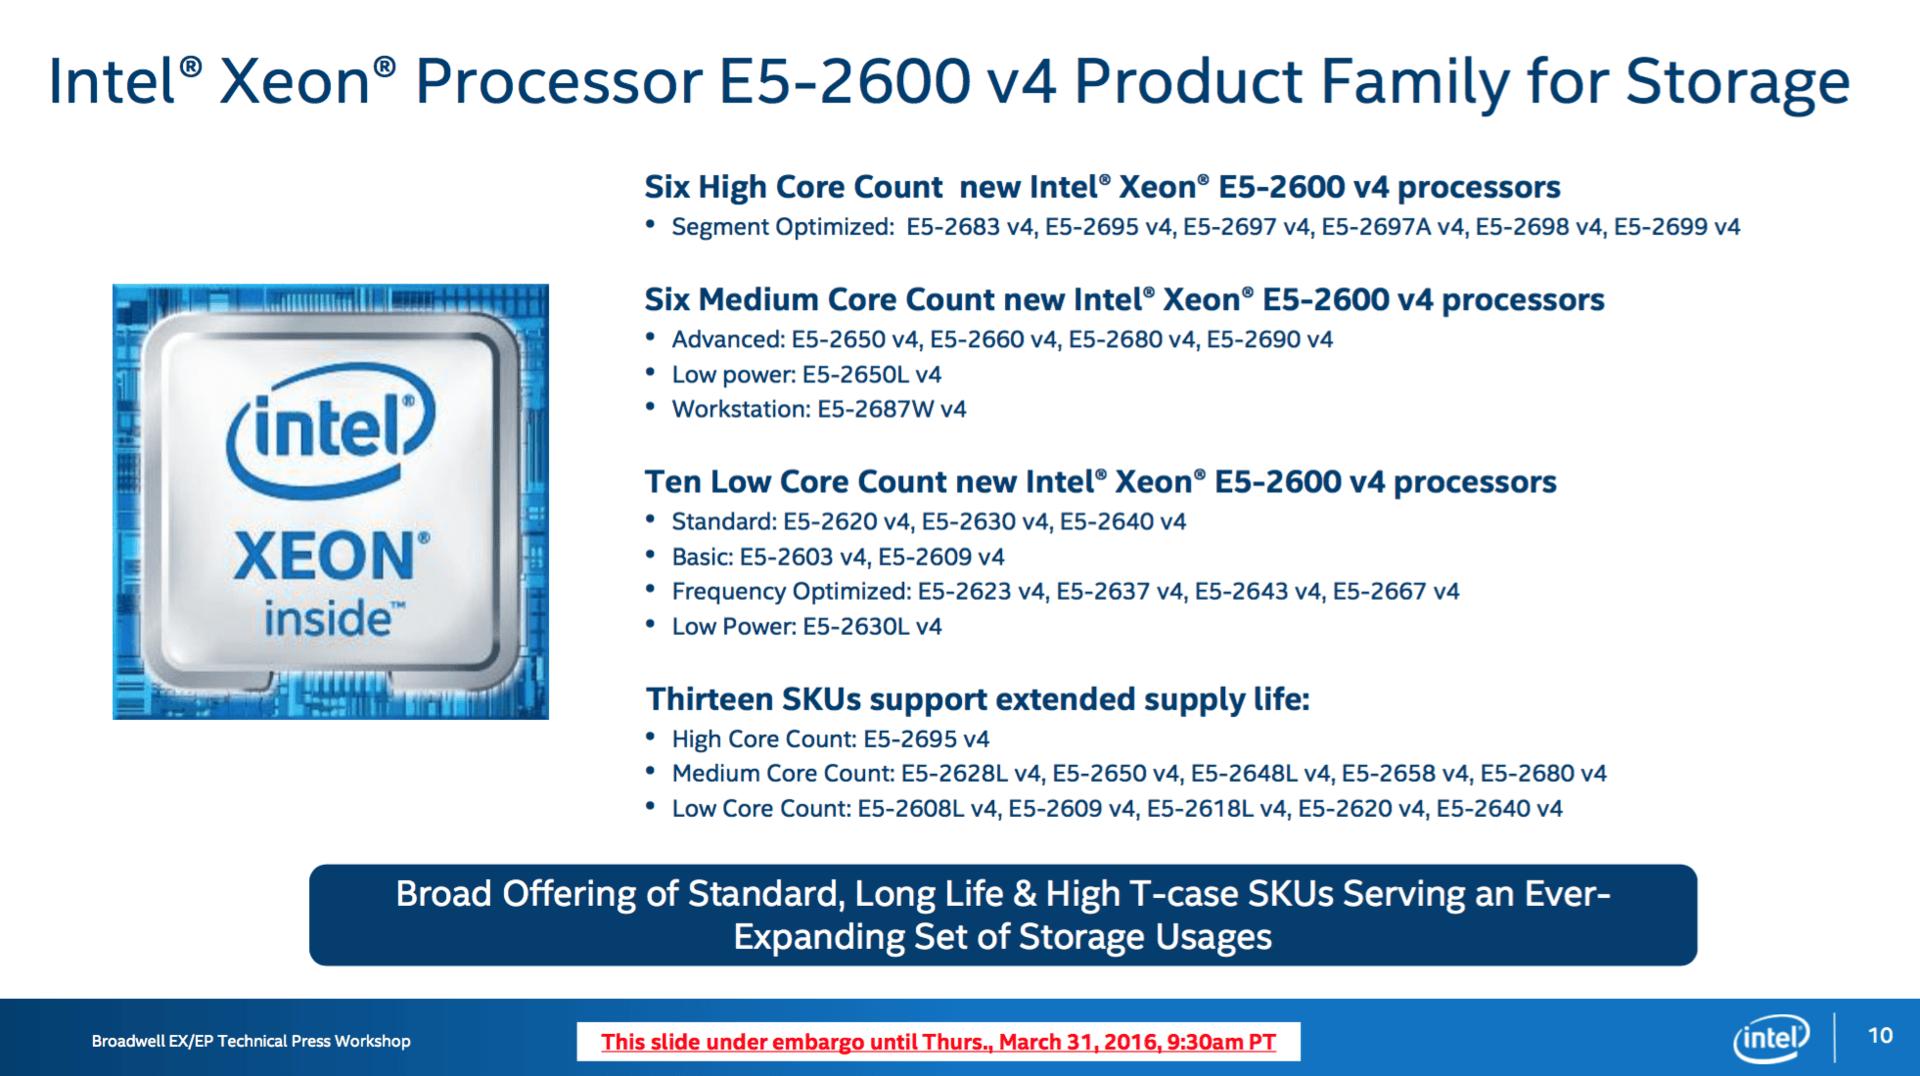 Untergruppen der Xeon E5-2500 v4